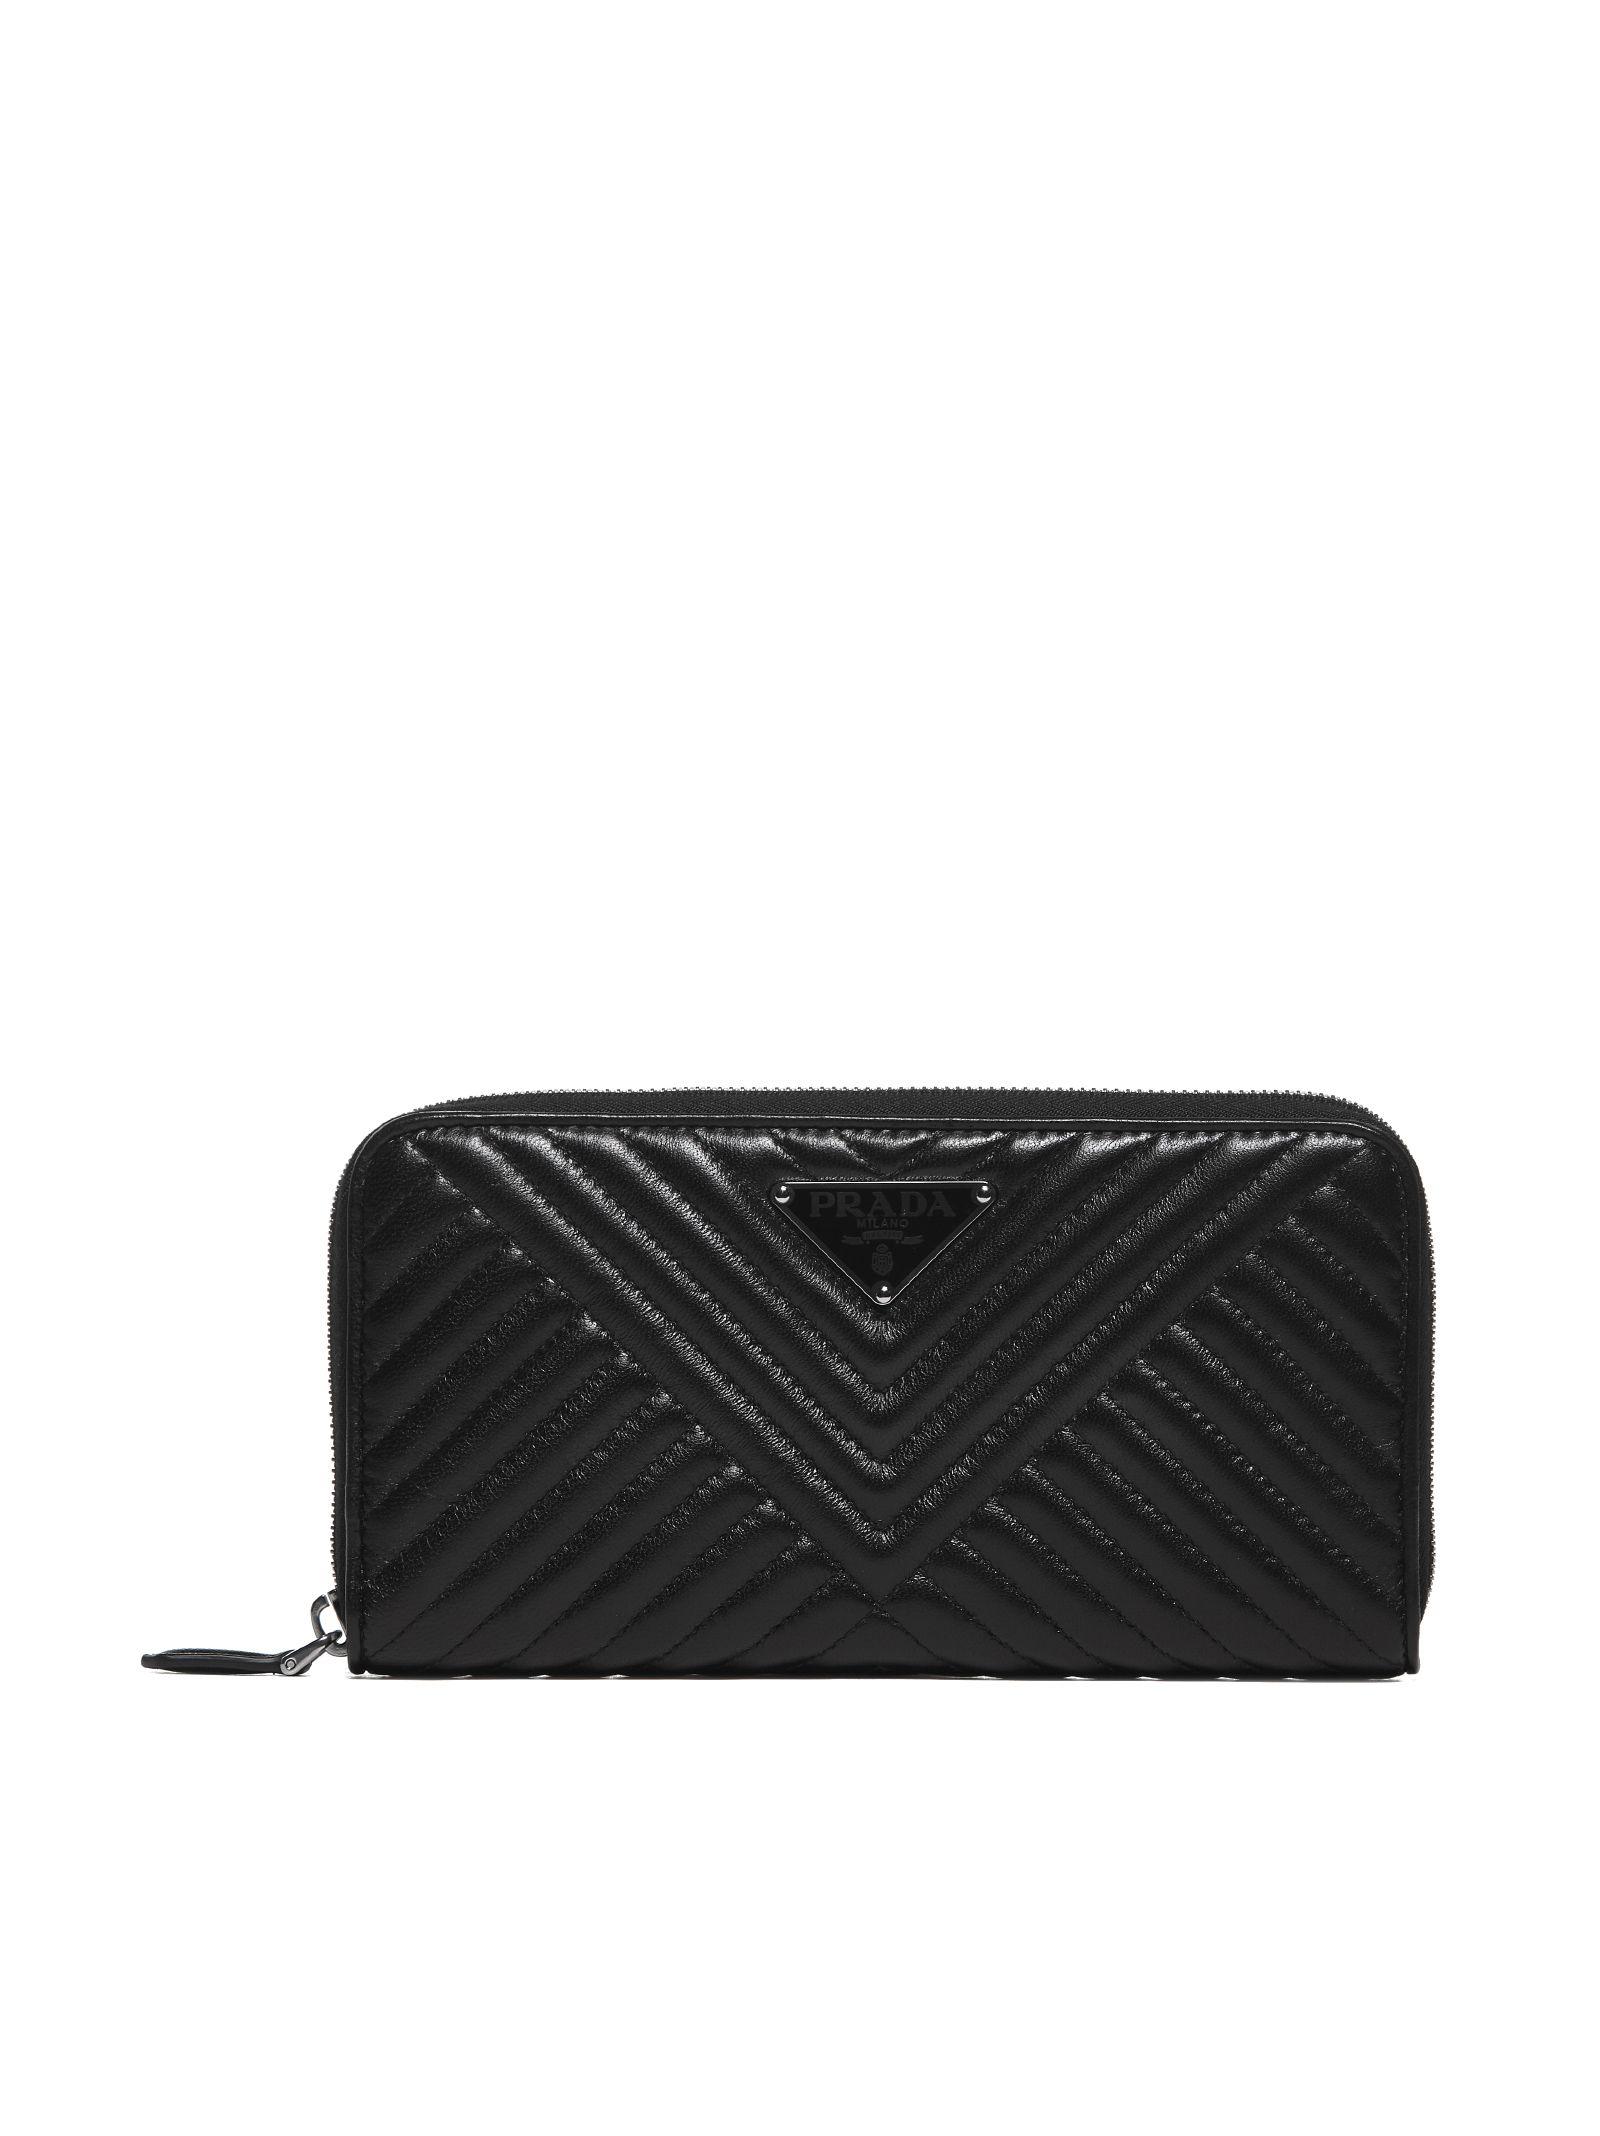 2b6dc7ad1d2a Prada Prada Saffiano Quilted Zip Around Wallet - Nero - 10774266 ...